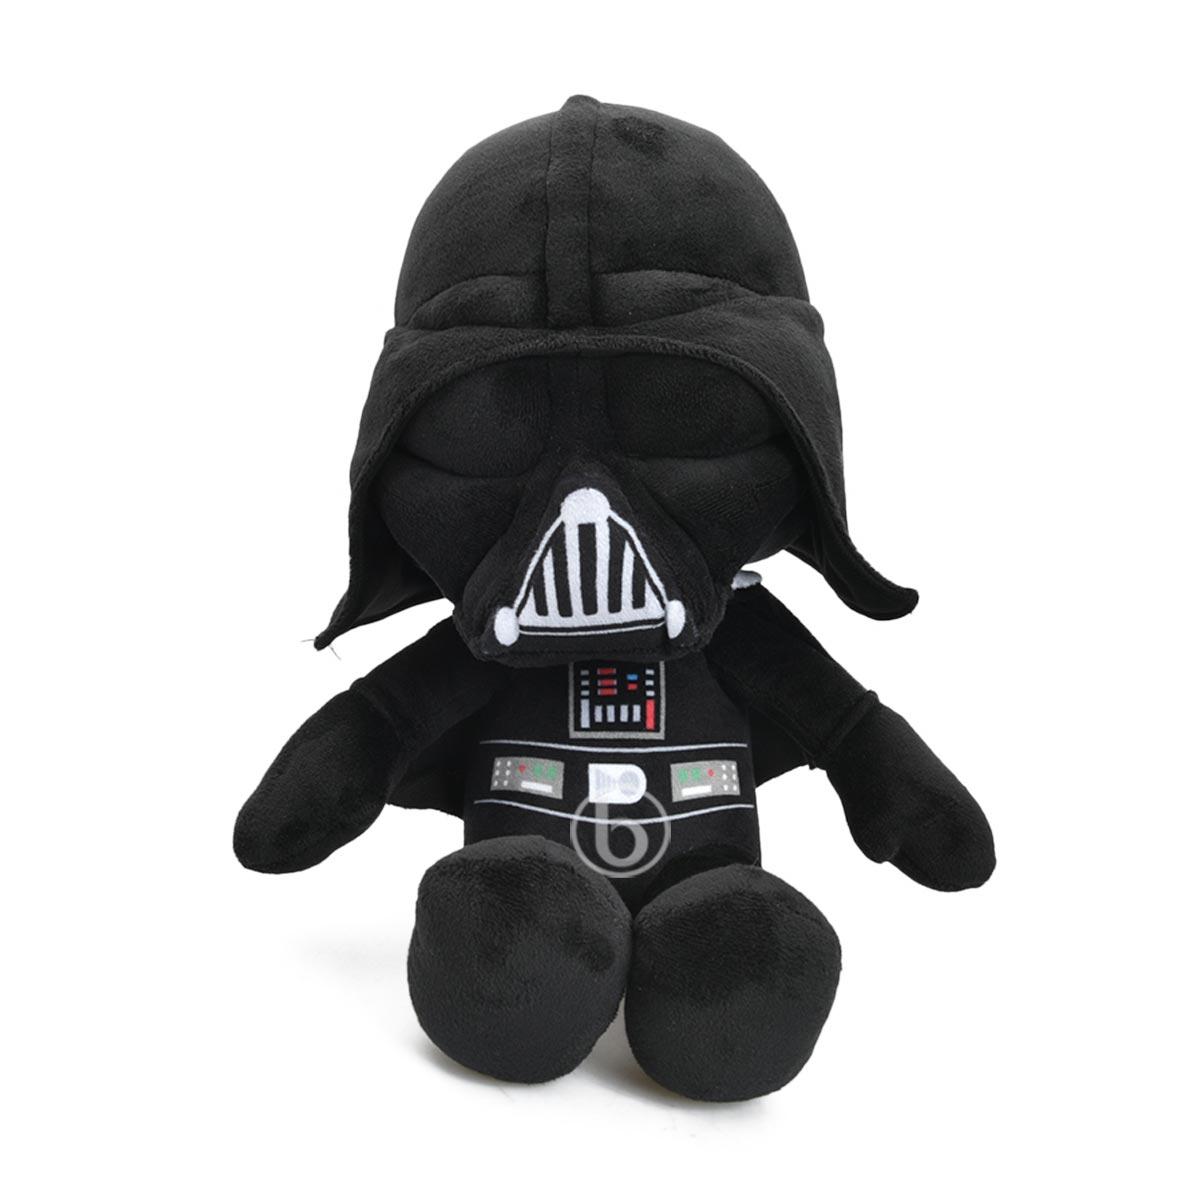 Star Wars Darth Vader Boneka Plush